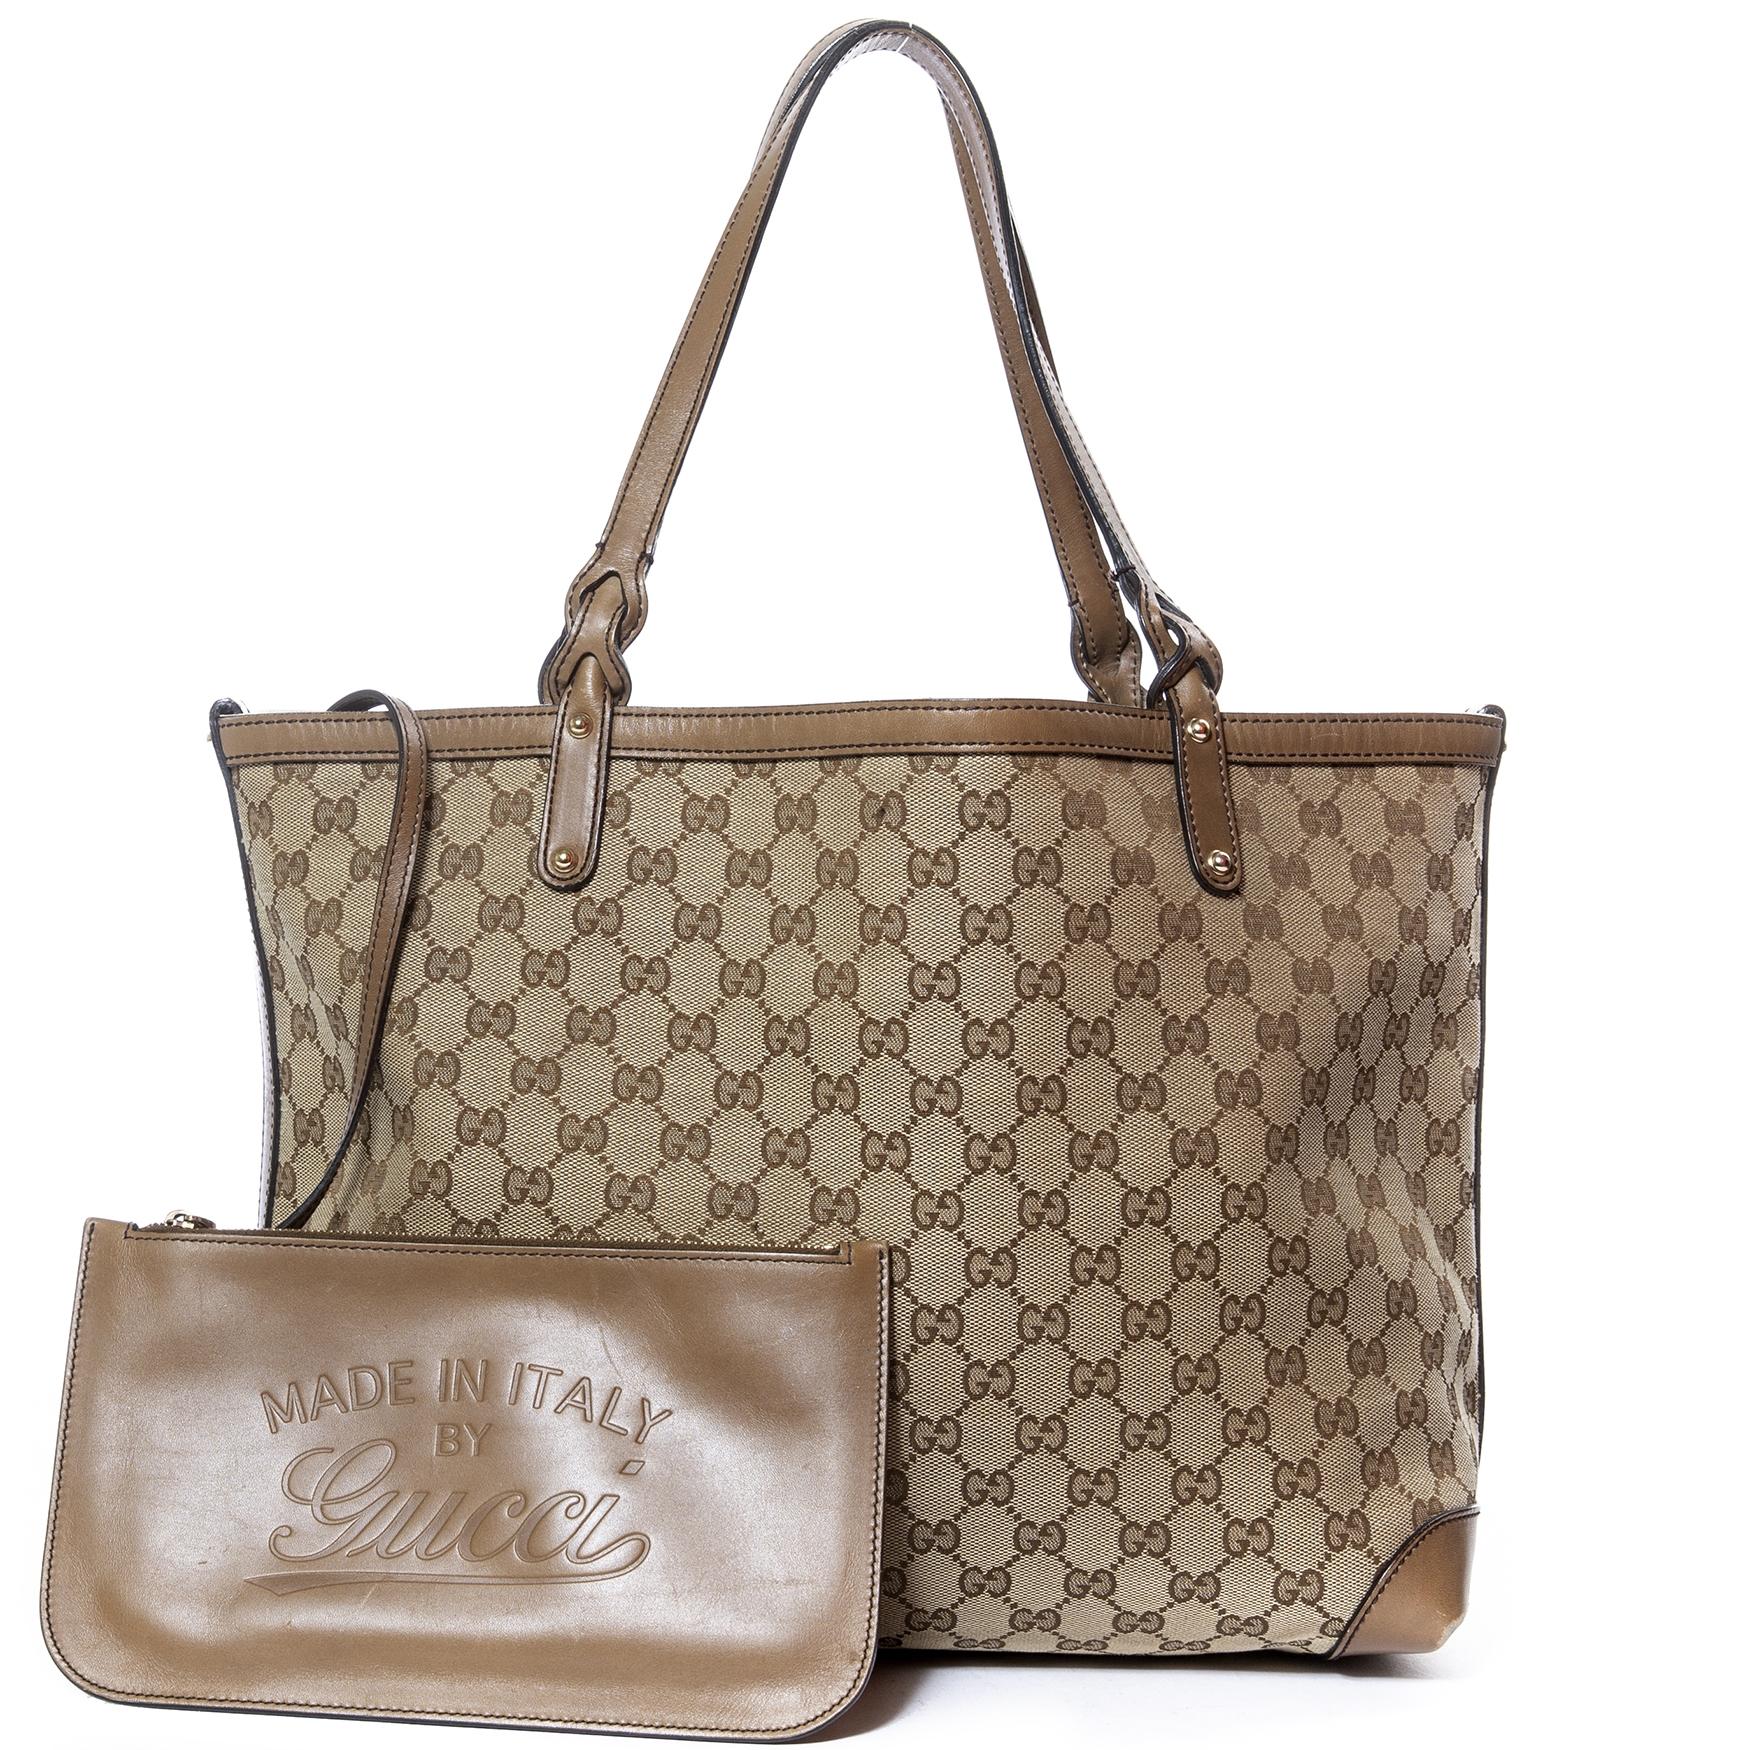 Gucci Monogram Canvas Shopper